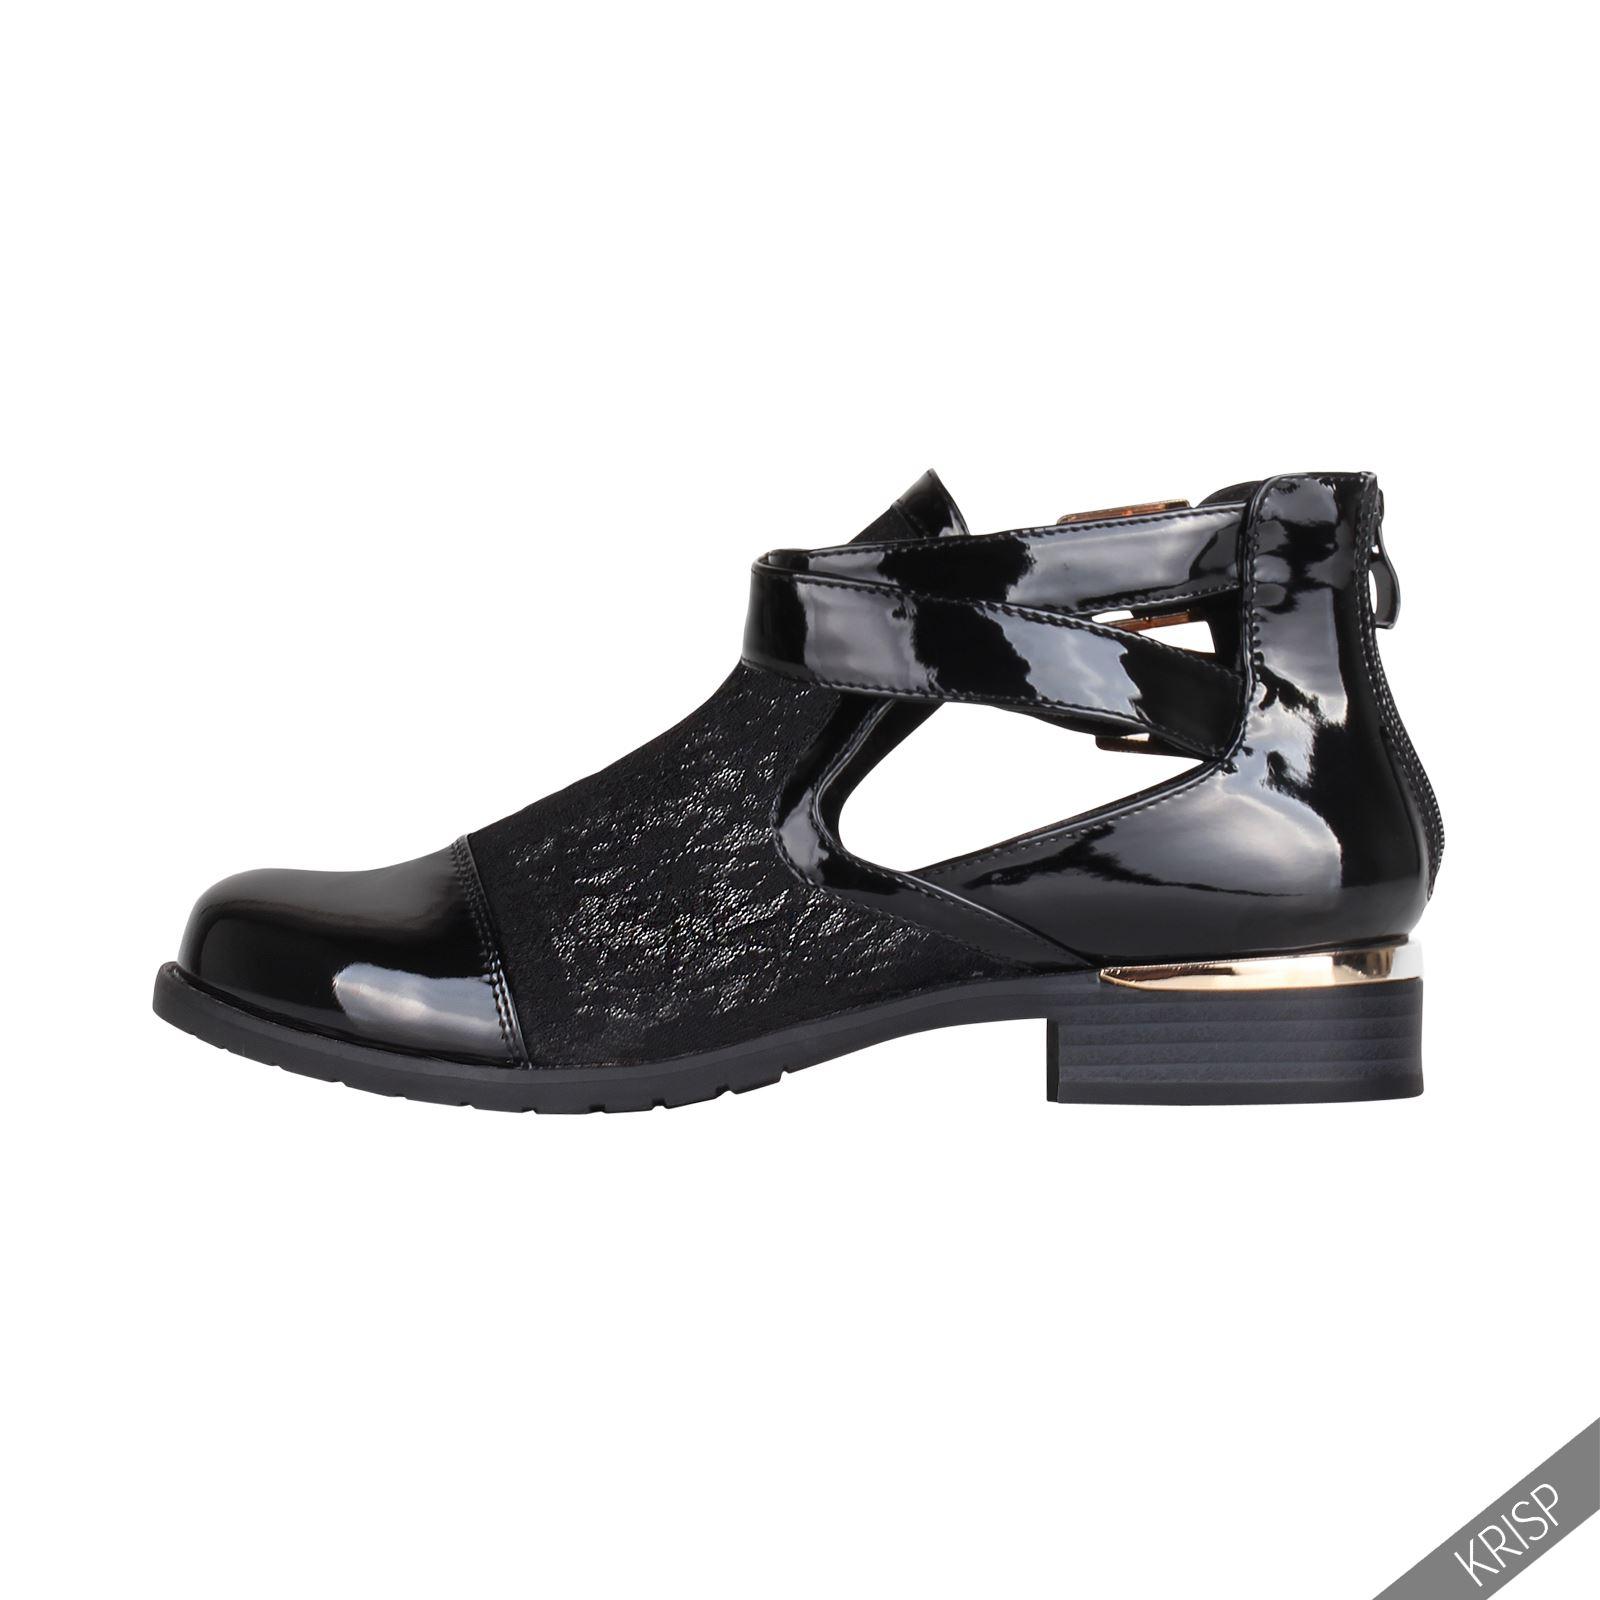 damen sommer schuhe hochglanz kunstleder boots offen fr hjahr spitze blockabsatz ebay. Black Bedroom Furniture Sets. Home Design Ideas